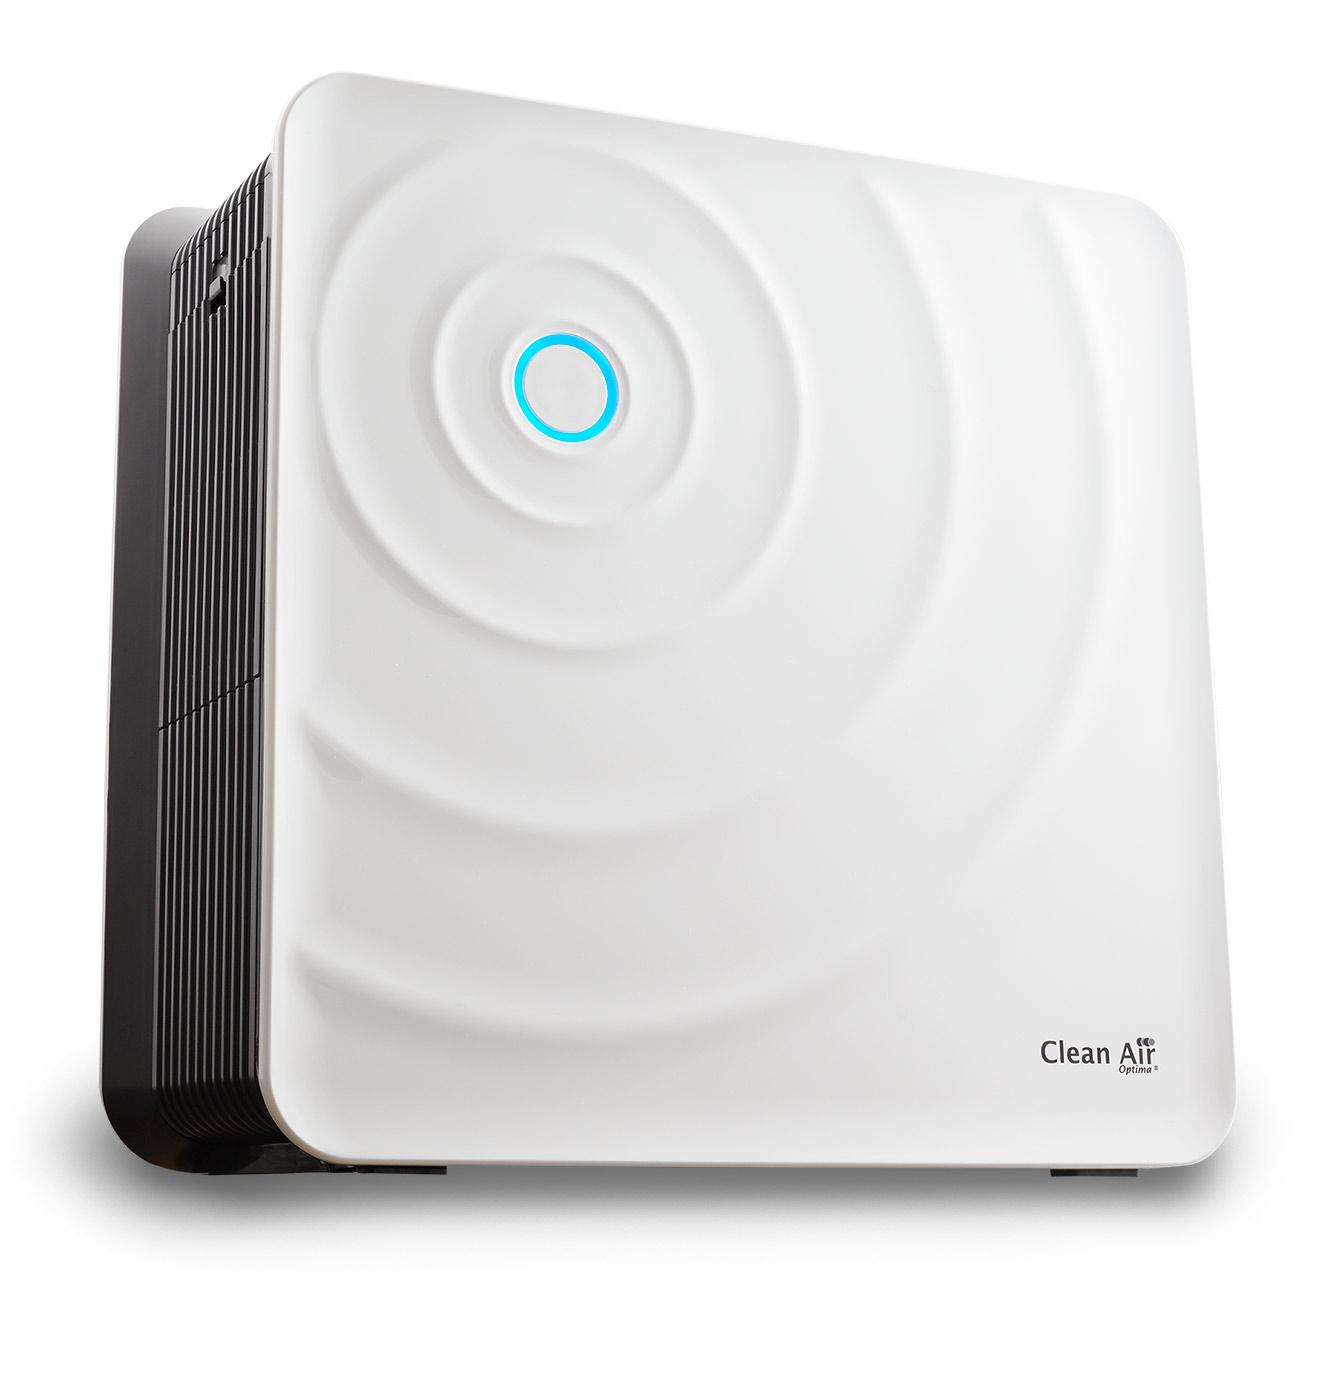 Air Humidifiers Air Purifiers Air Cleaners Ionizers – Clean Air  #01ADCA